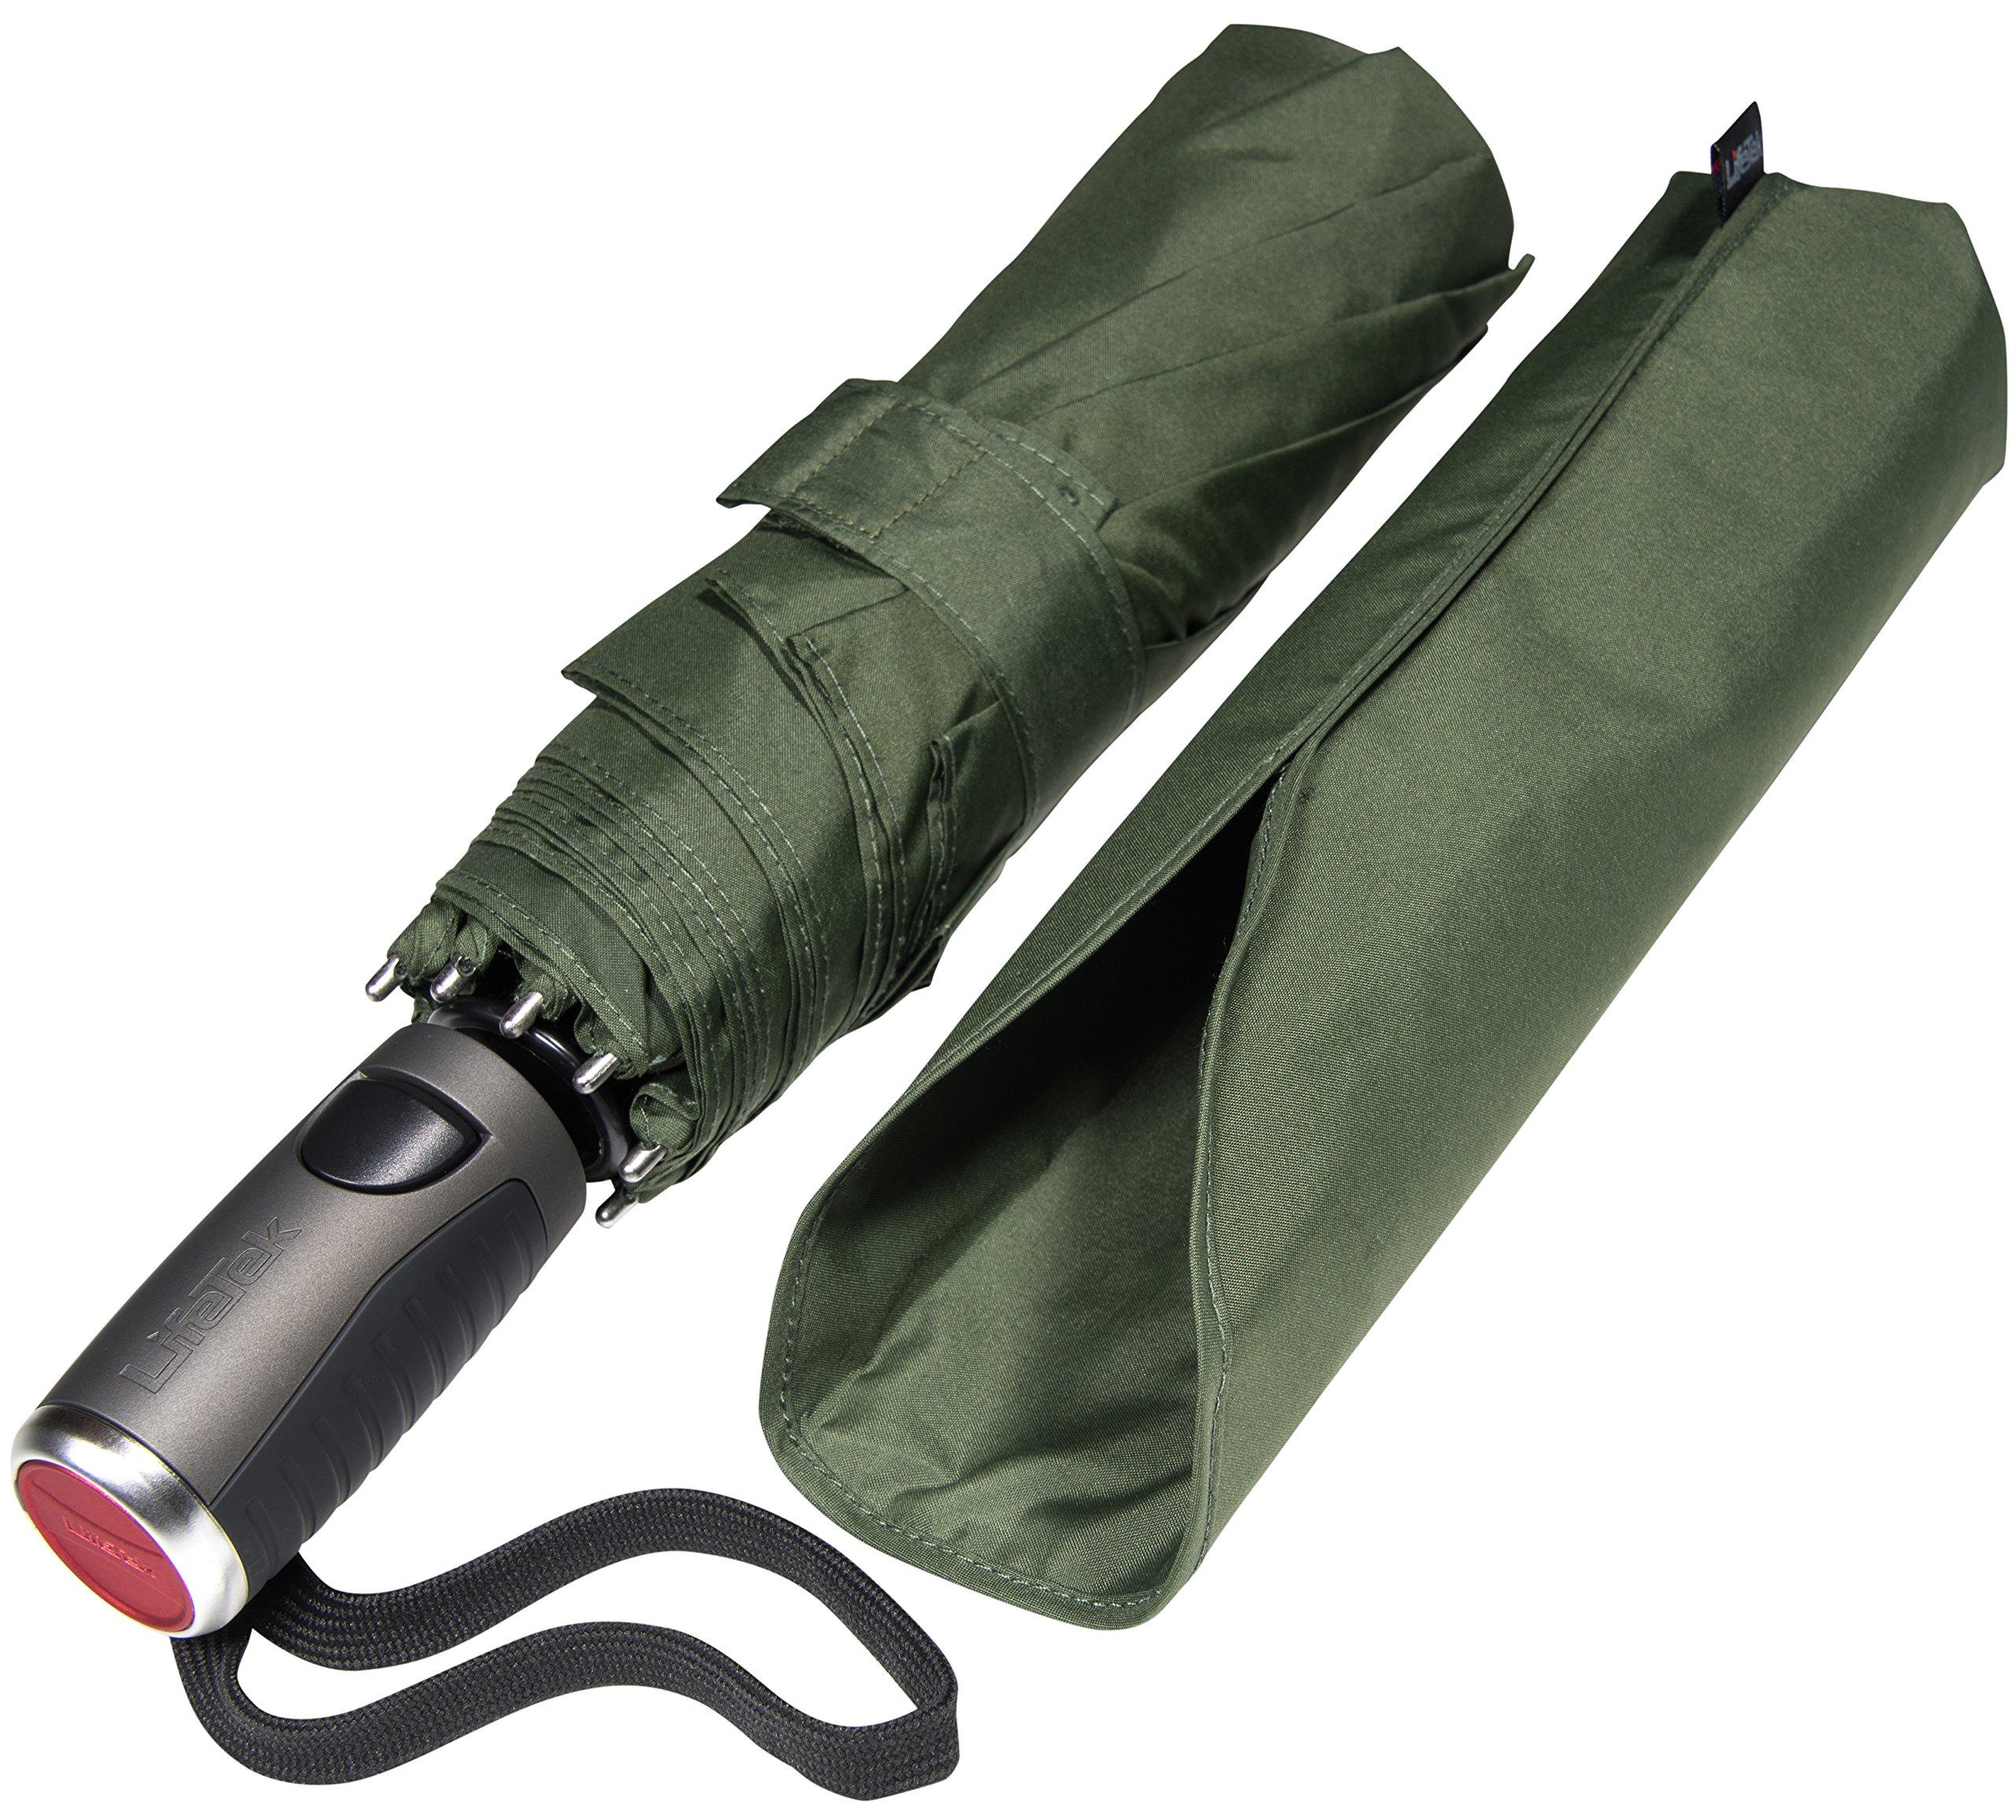 LifeTek Windproof Travel Umbrella Compact Automatic Open Close Small Folding Teflon Repellent Canopy Umbrellas fits Golf Purse Backpack Wind Resistant for Men and Women Traveler FX1 45 inch Green